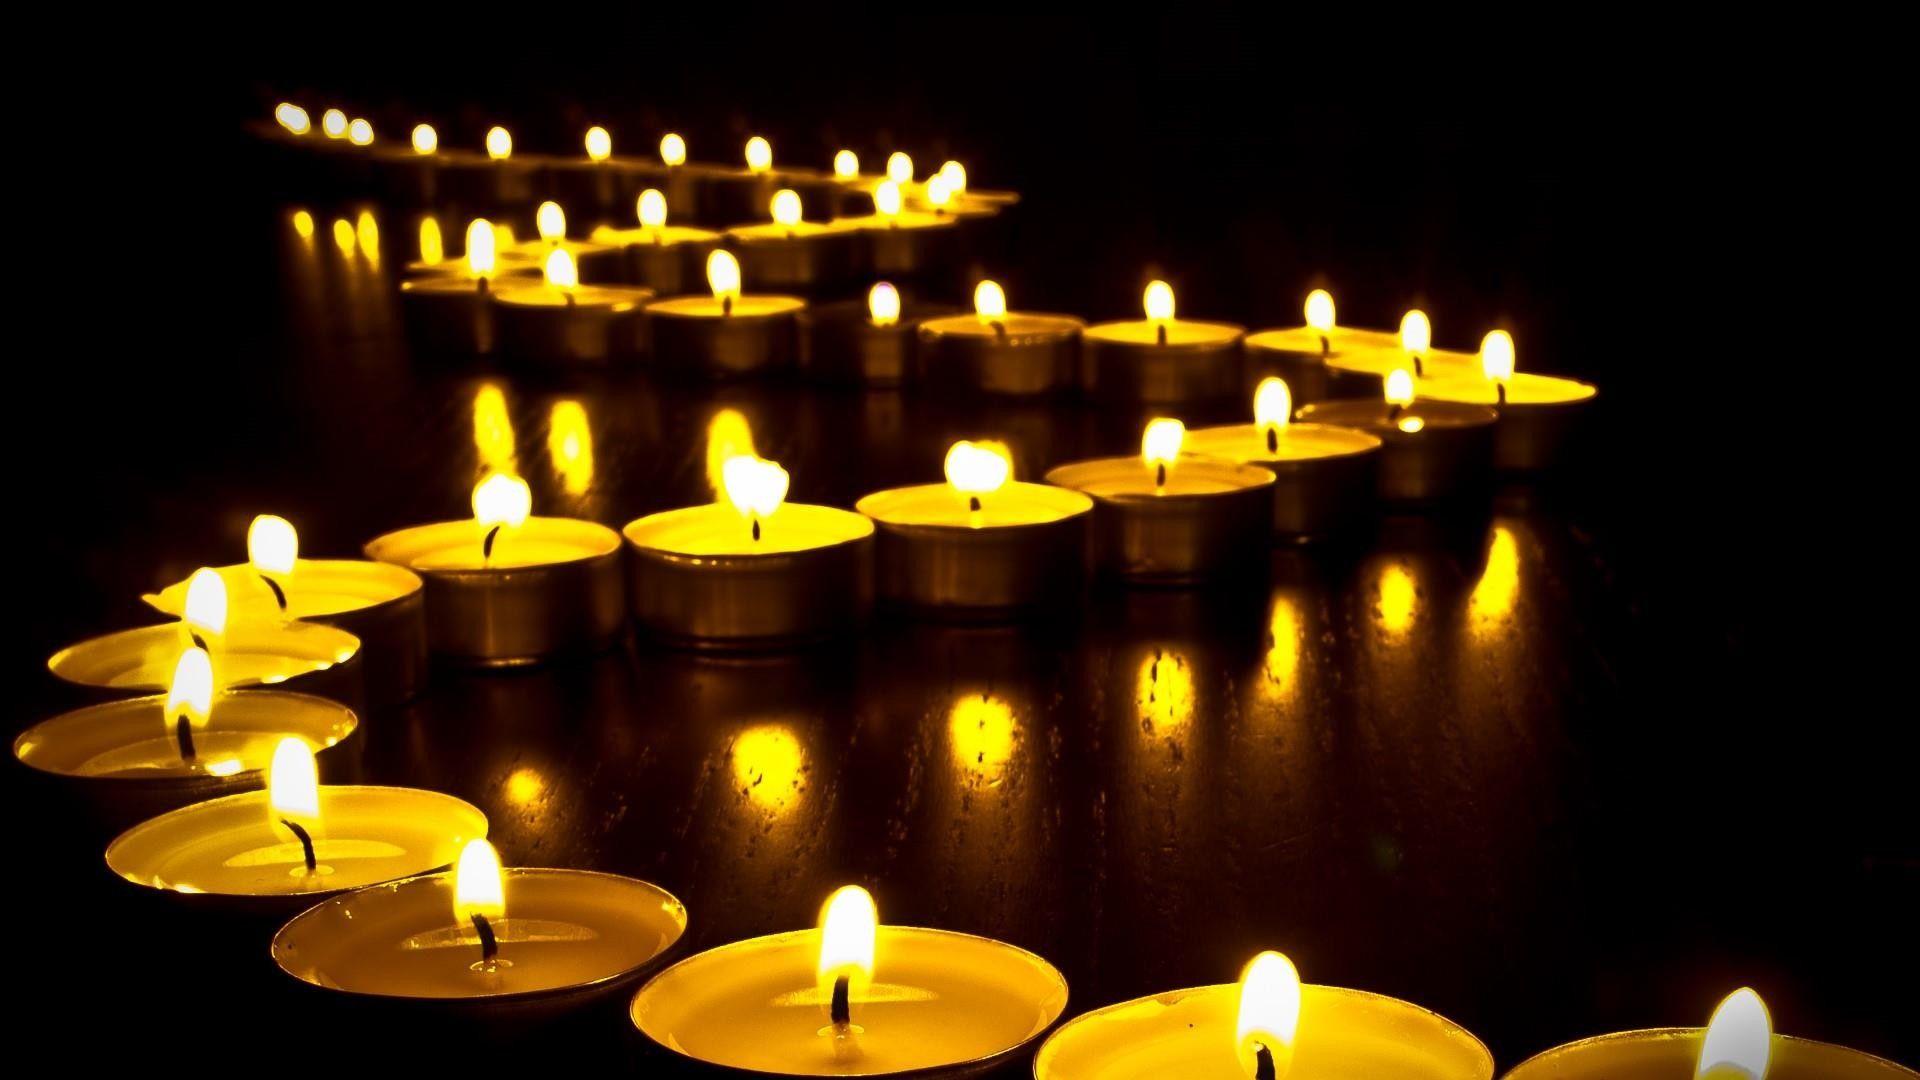 burning candle images